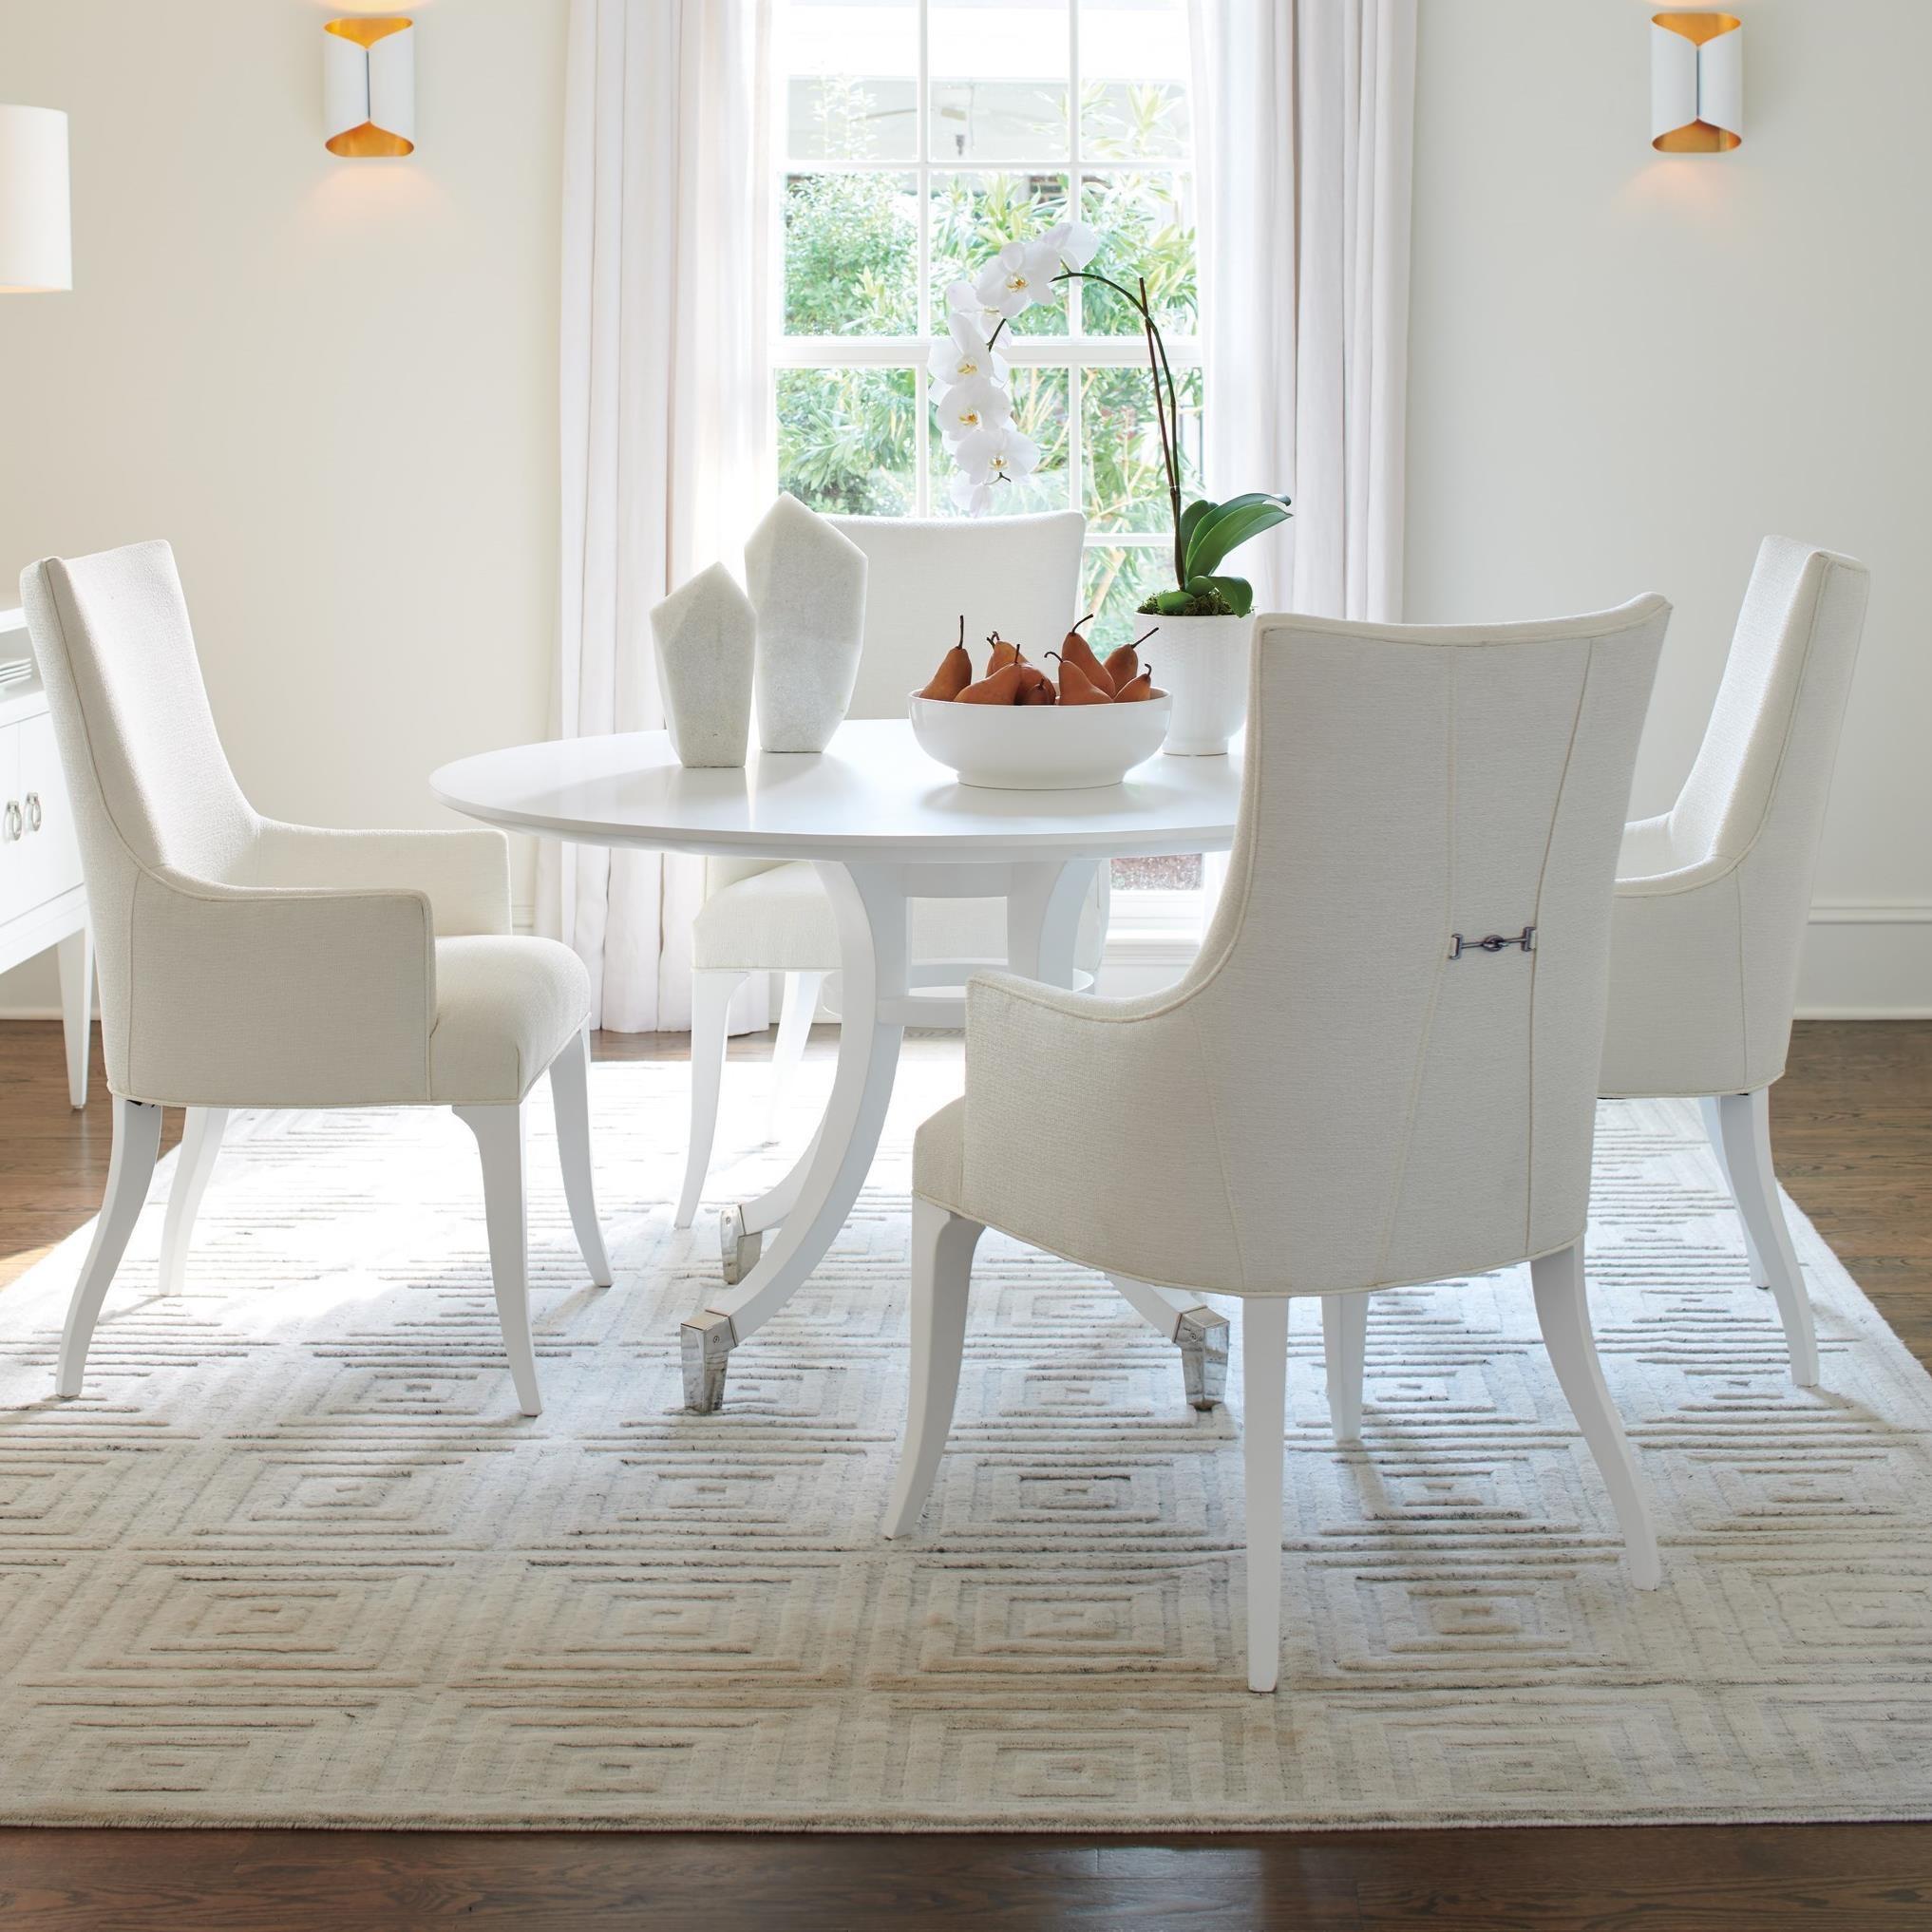 Avondale 5 Piece Dining Set by Lexington at Baer's Furniture